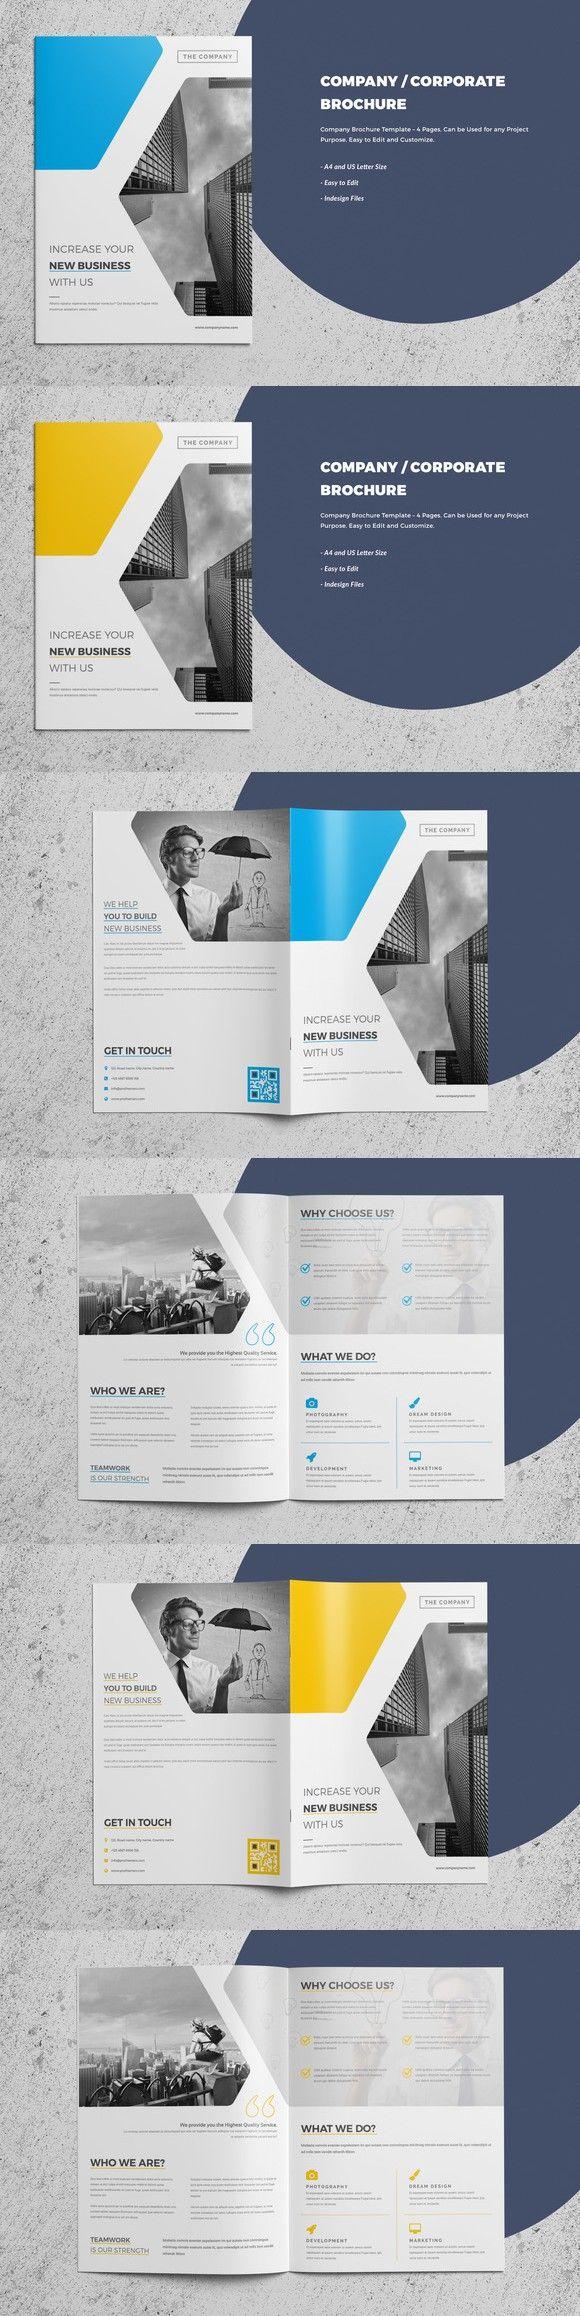 CorporateCompany Brochure Page Brochure Templates - 4 page brochure template